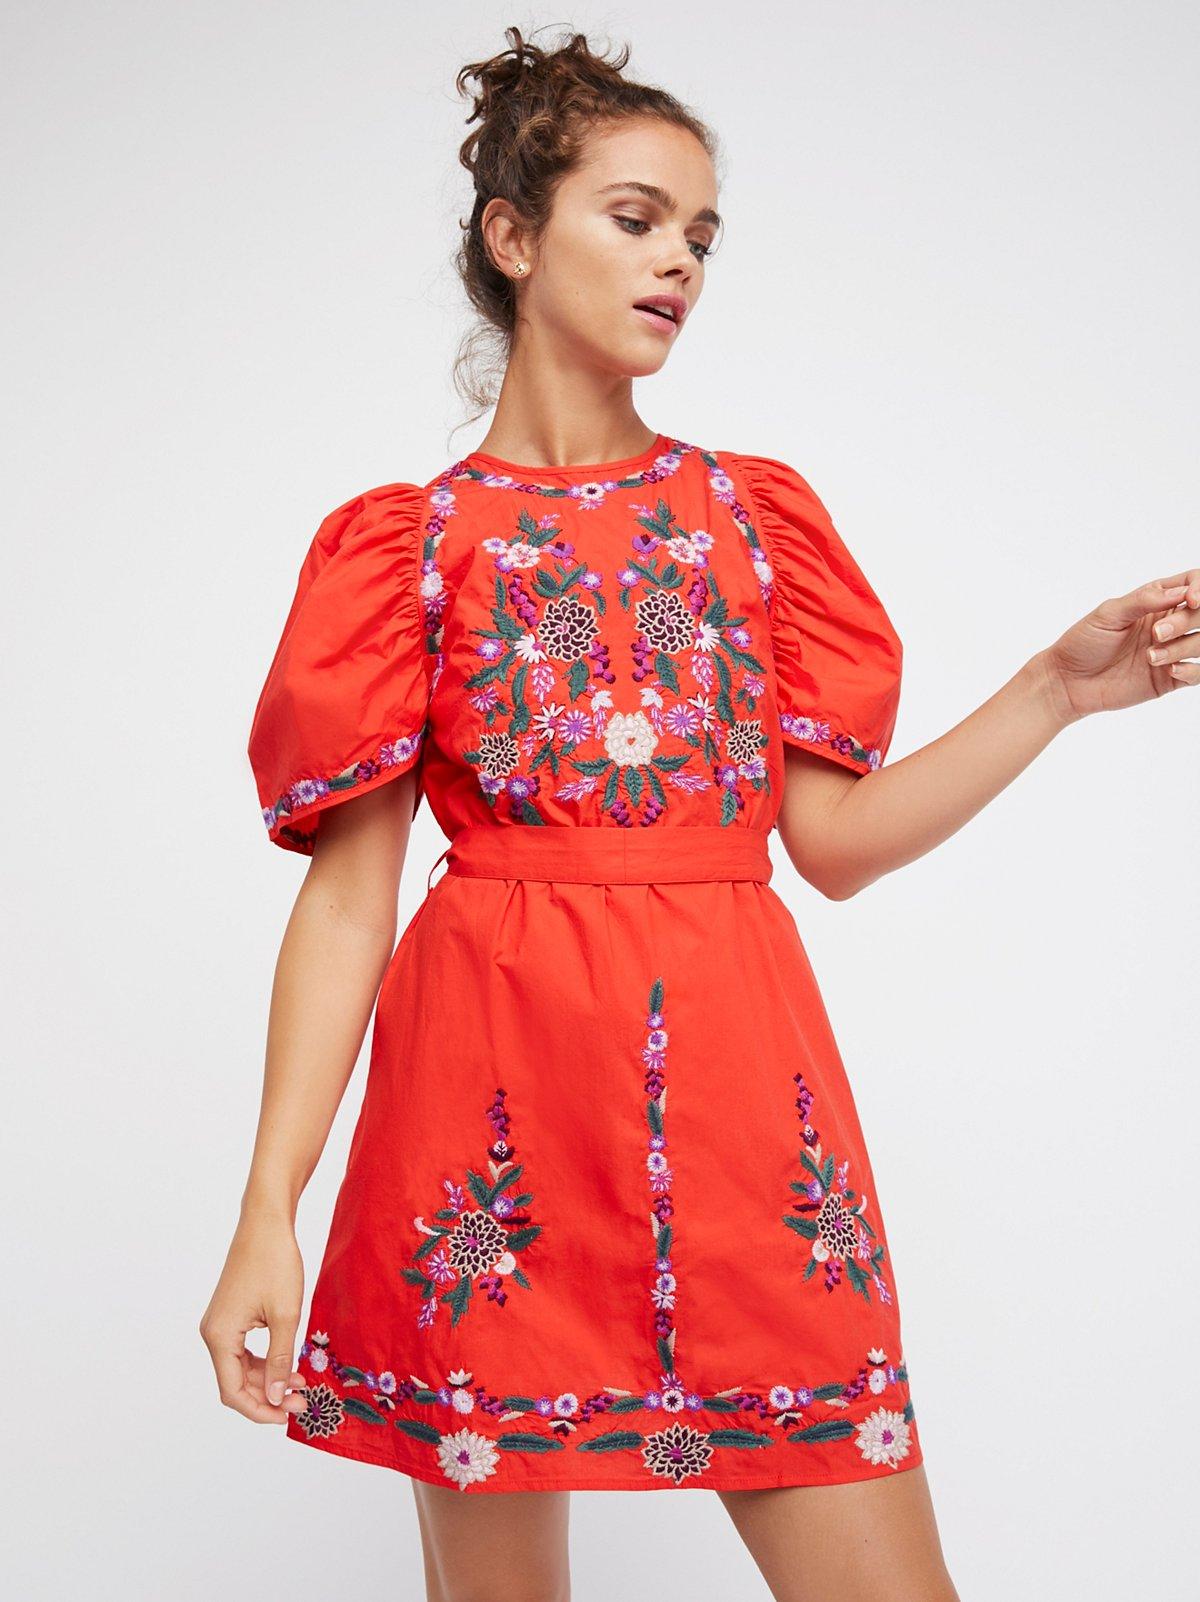 The Evangeline Dress